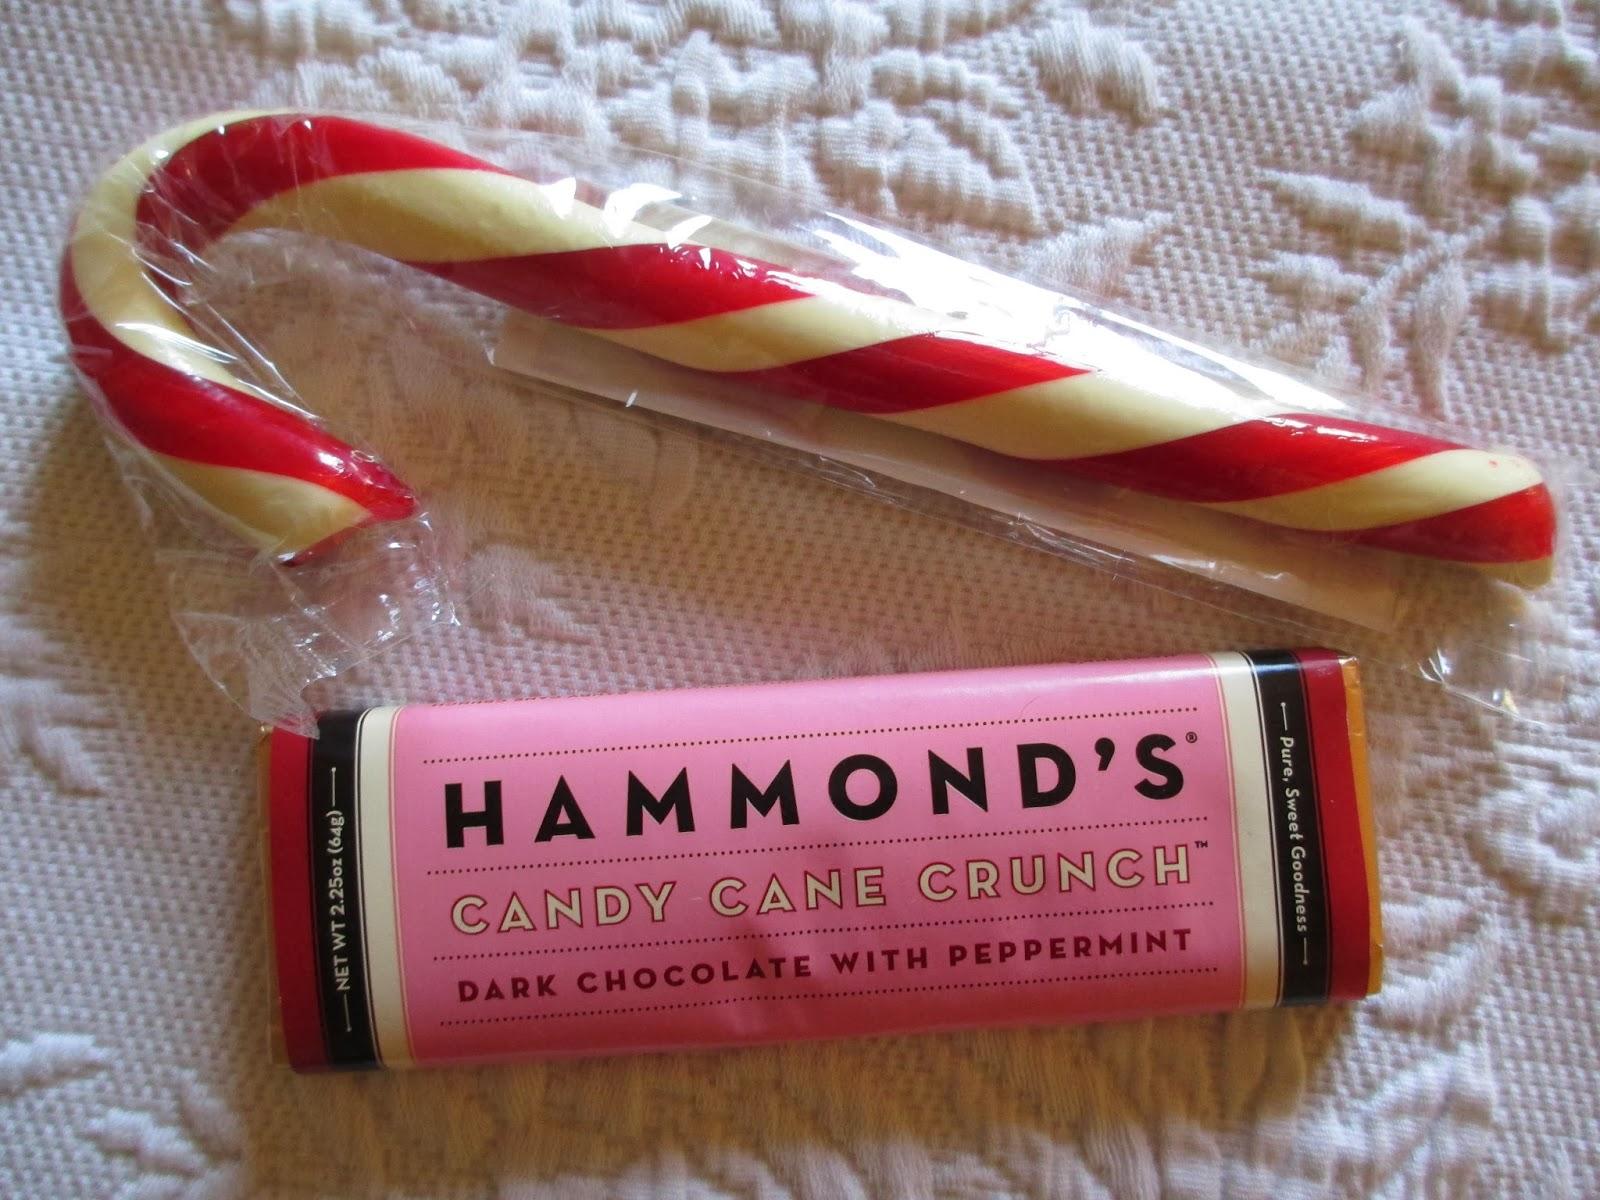 Hammond's: Candy Cane Crunch - Delirious Documentations